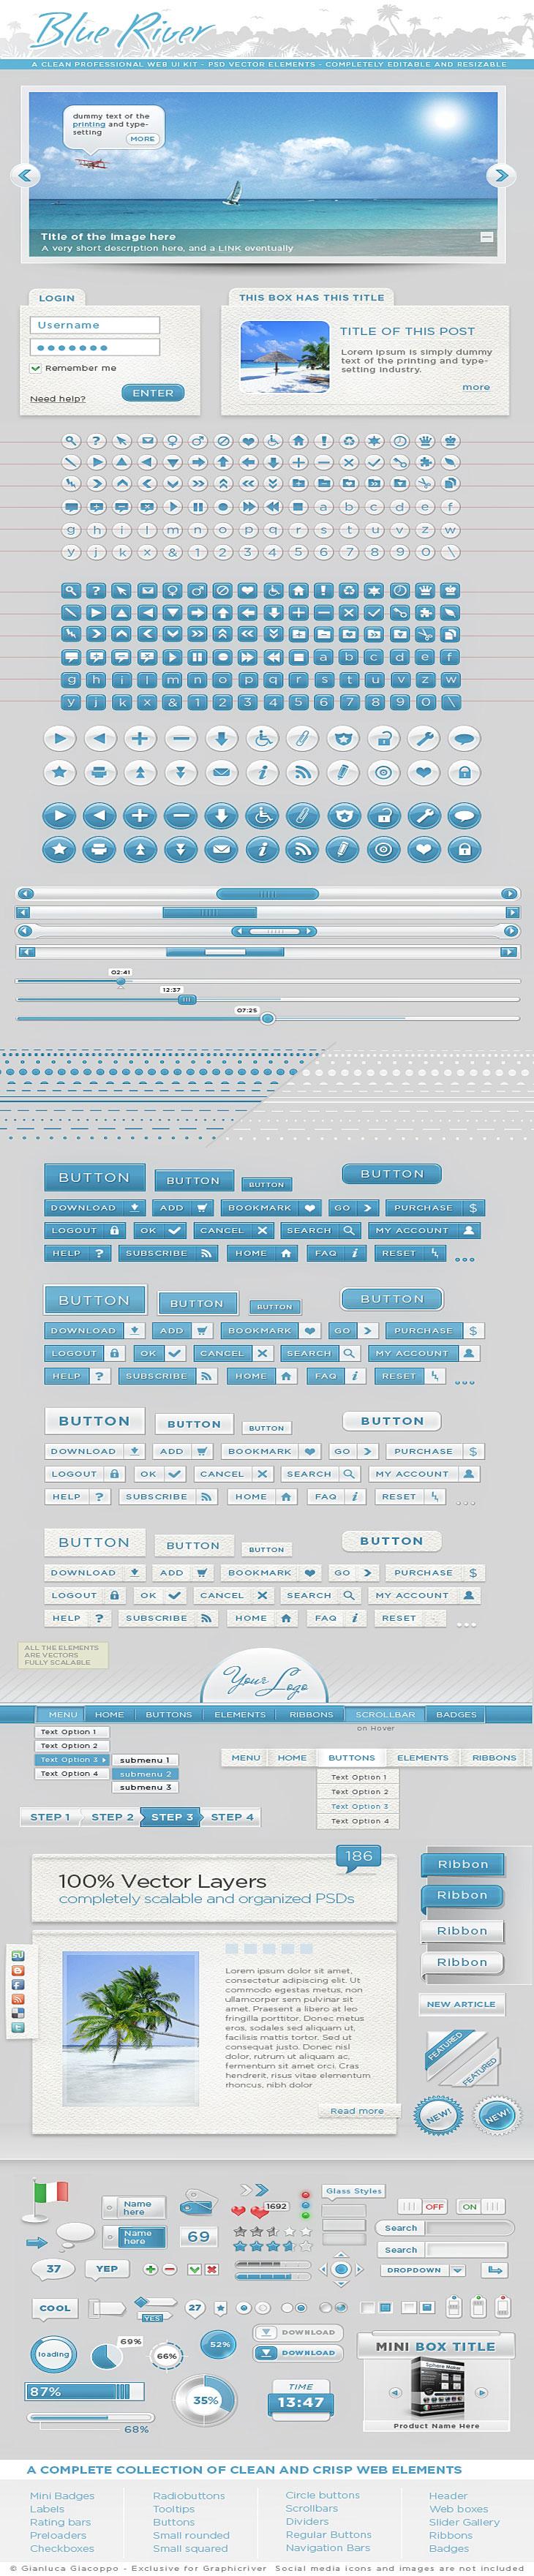 Web Graphic Kit UI Elements